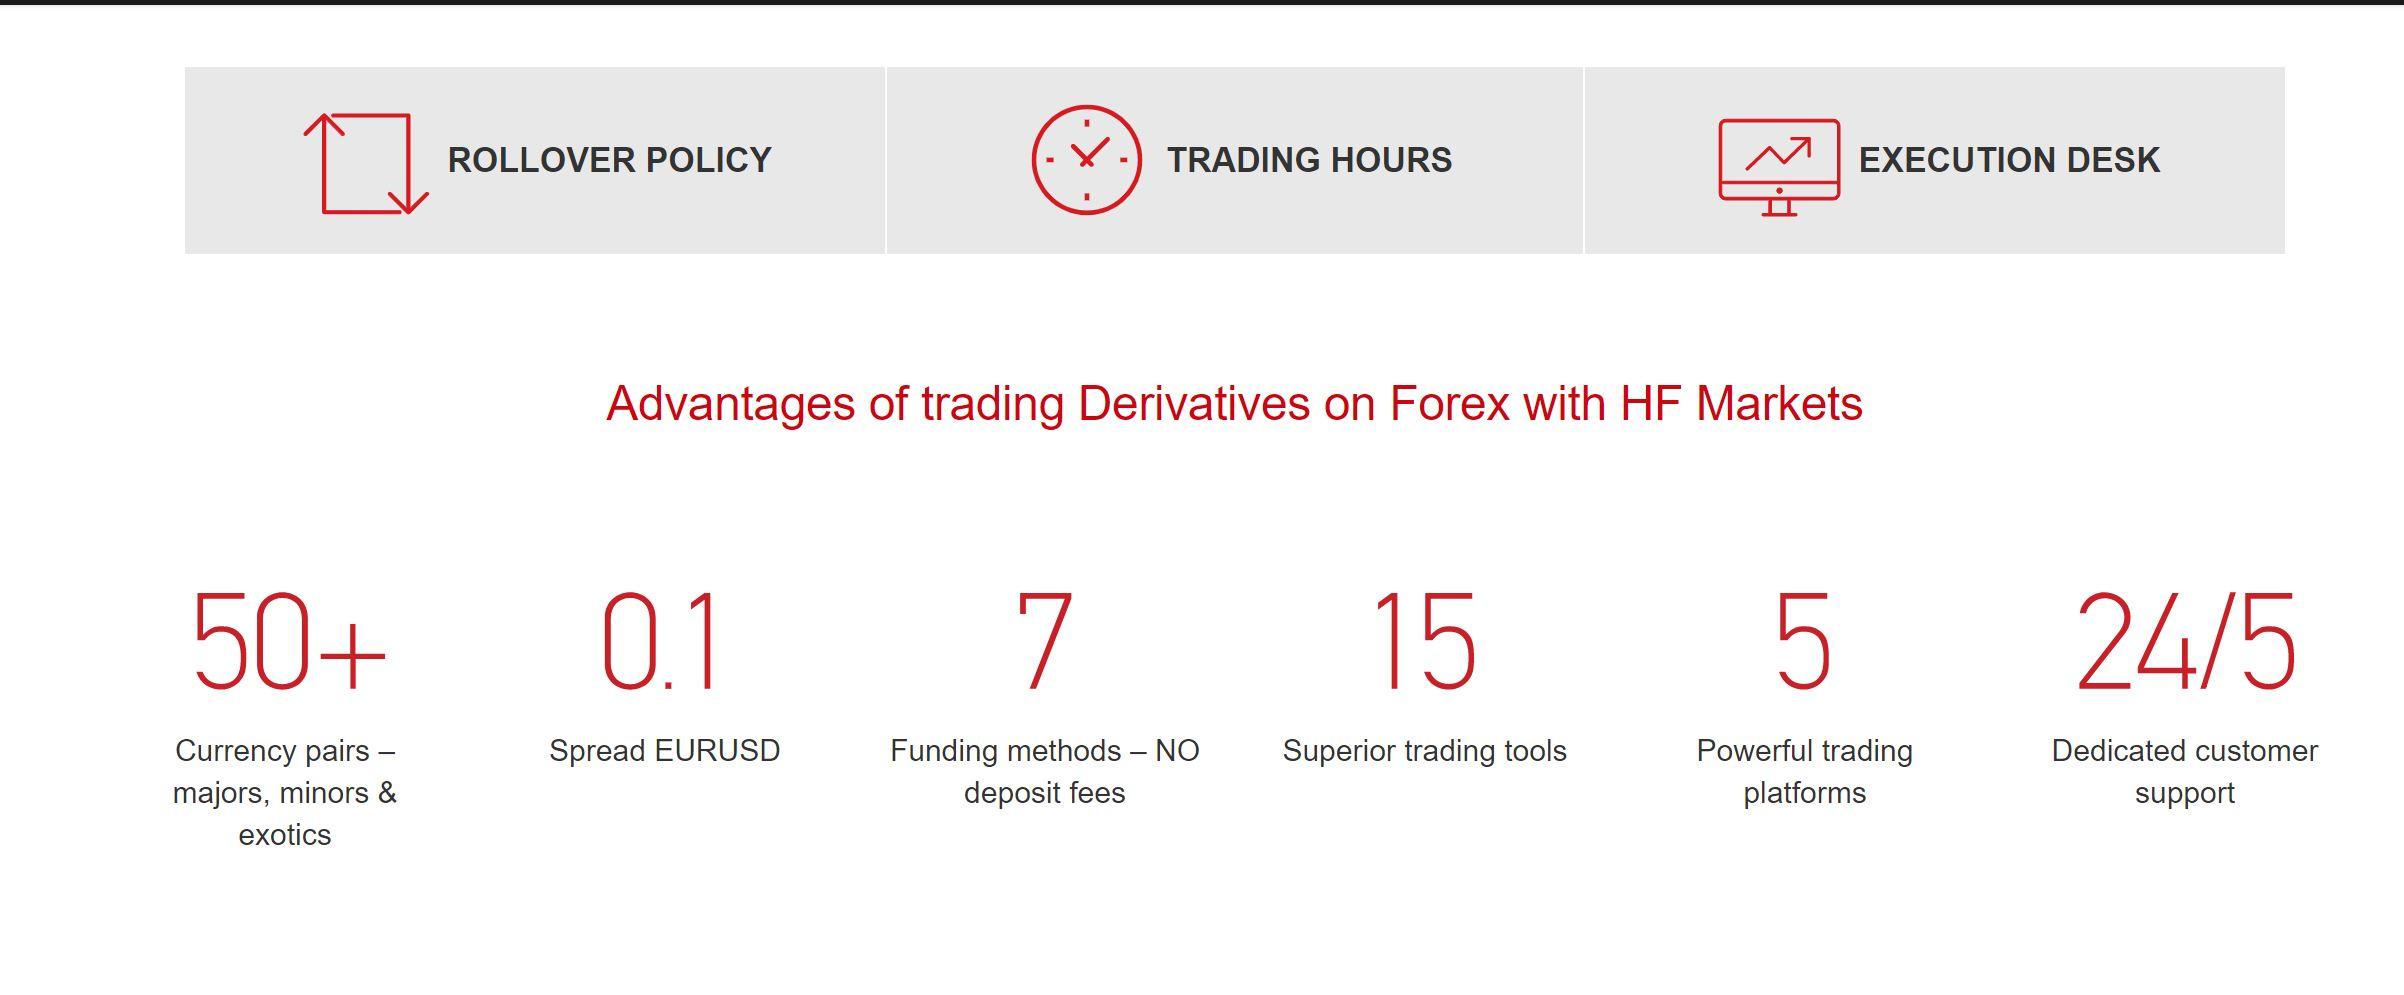 libertex mobile trading best no deposit bonus brokers south africa